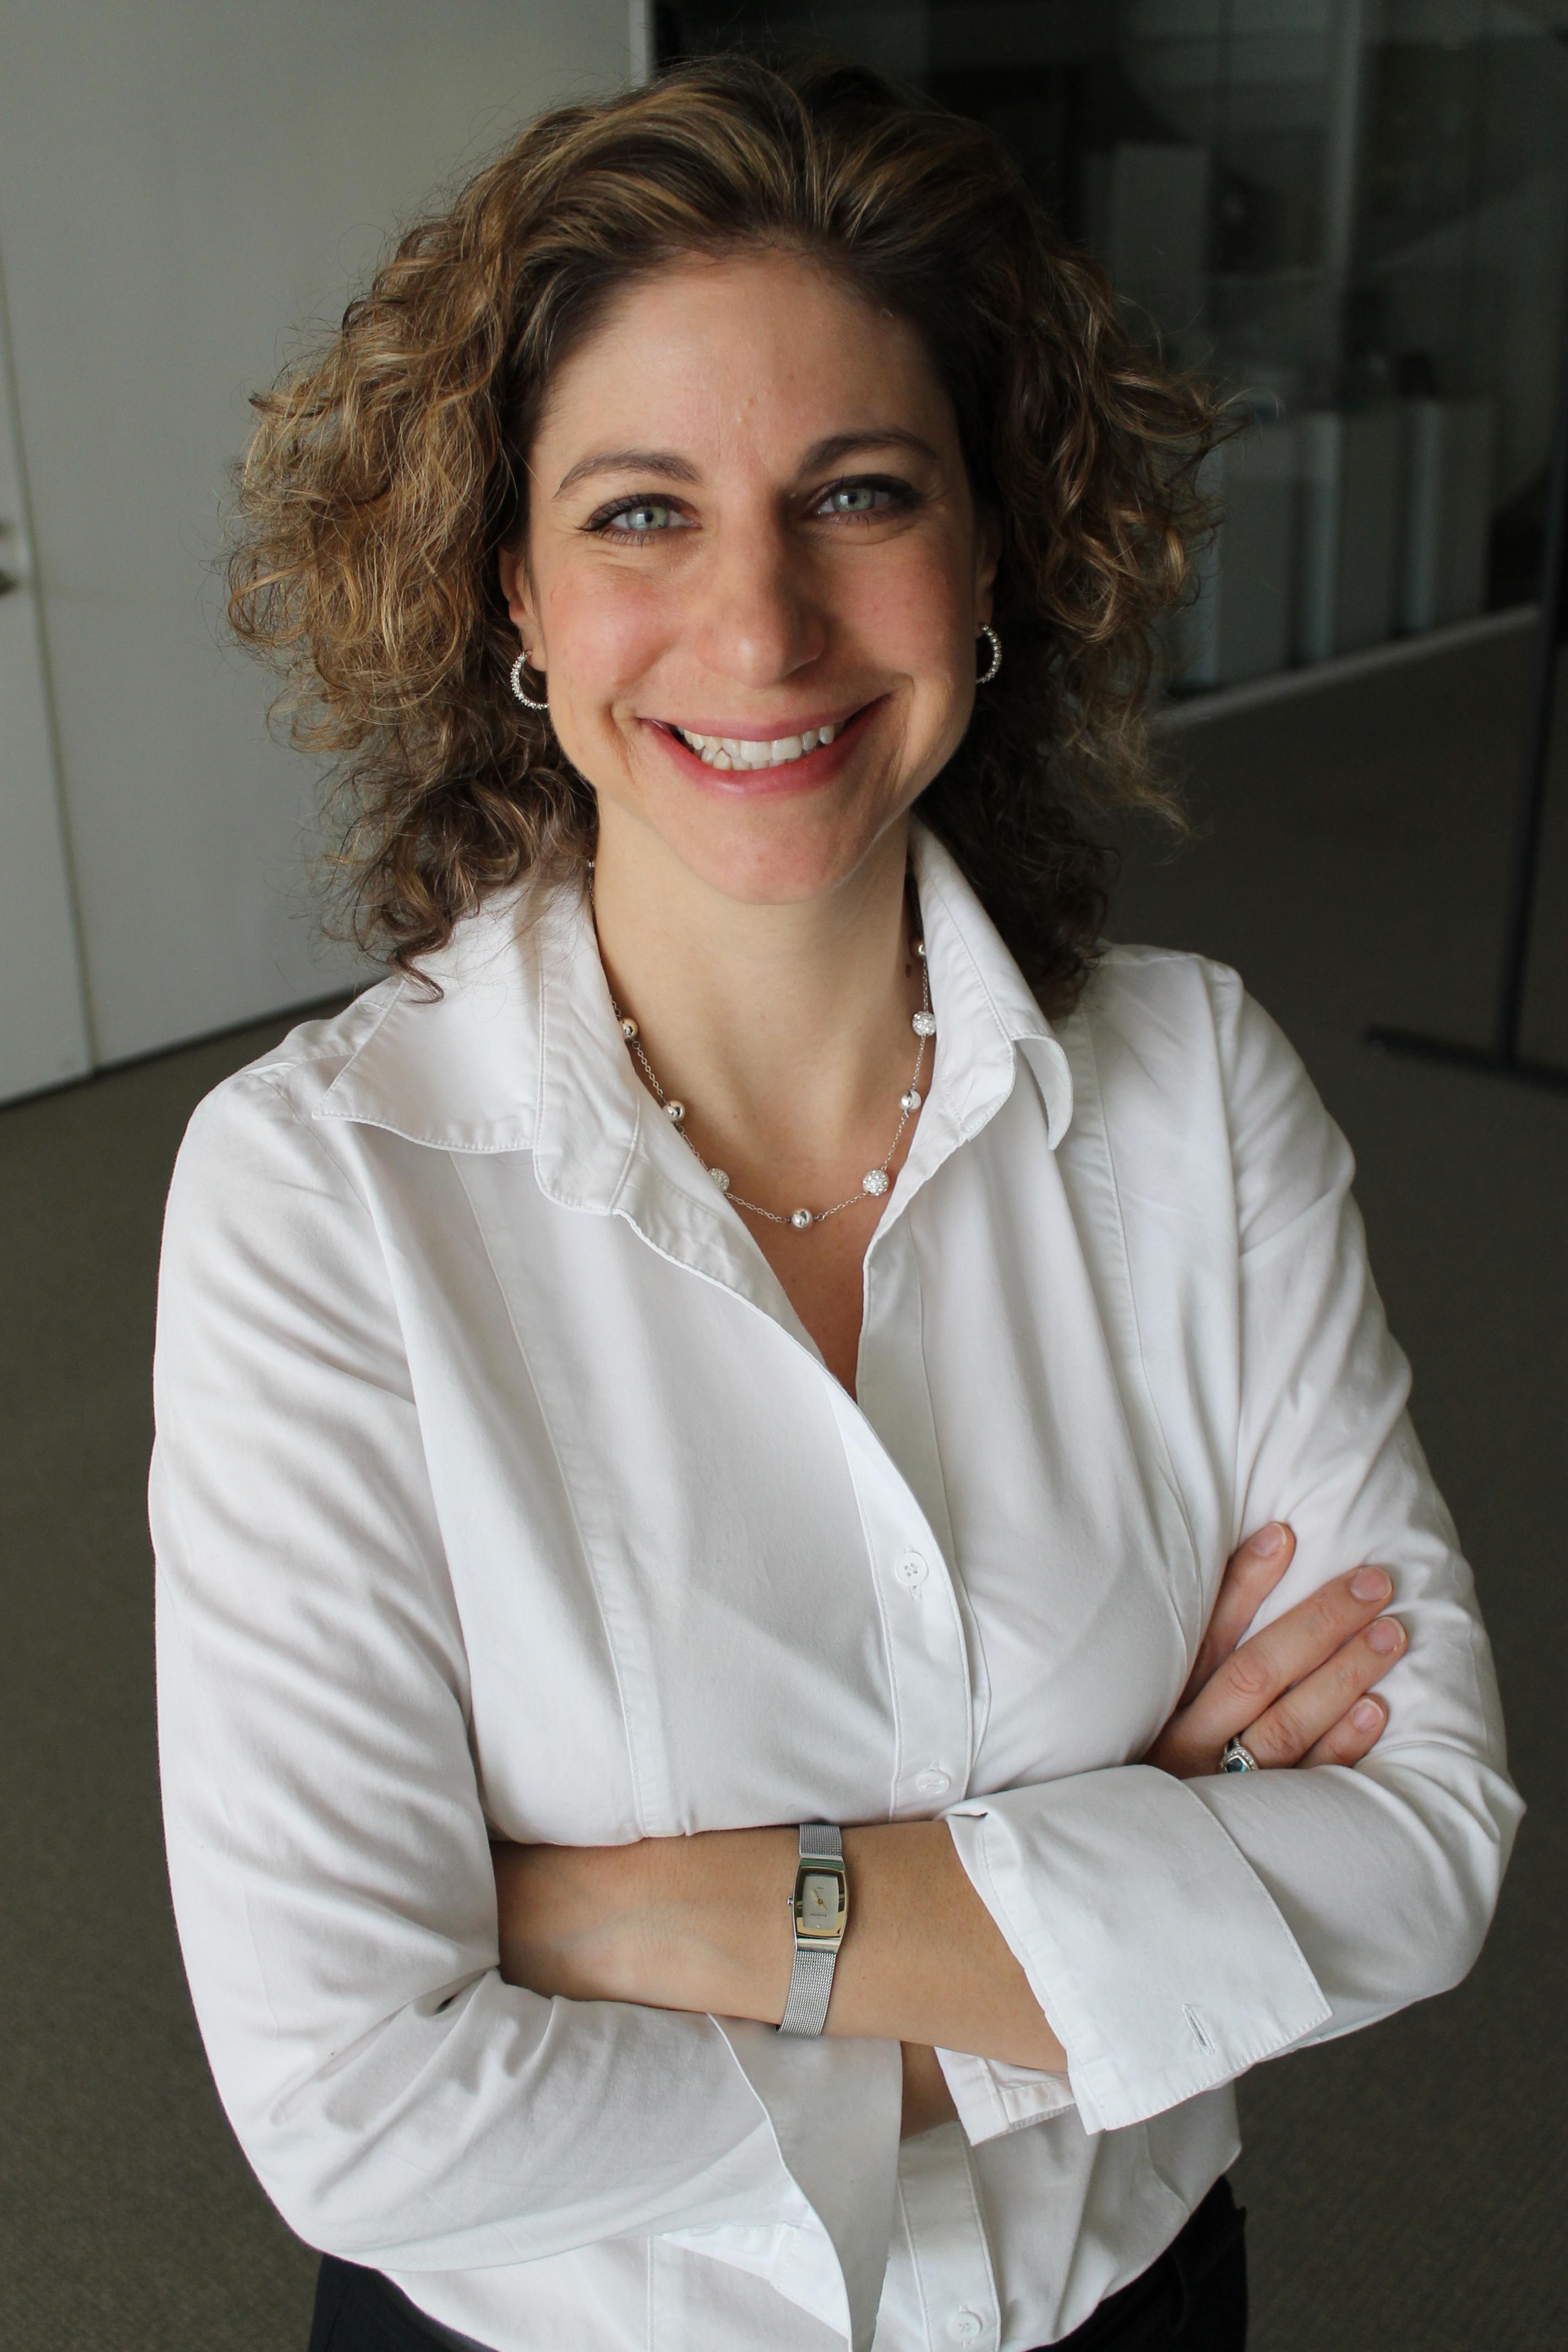 Alicia Goldstein Raun